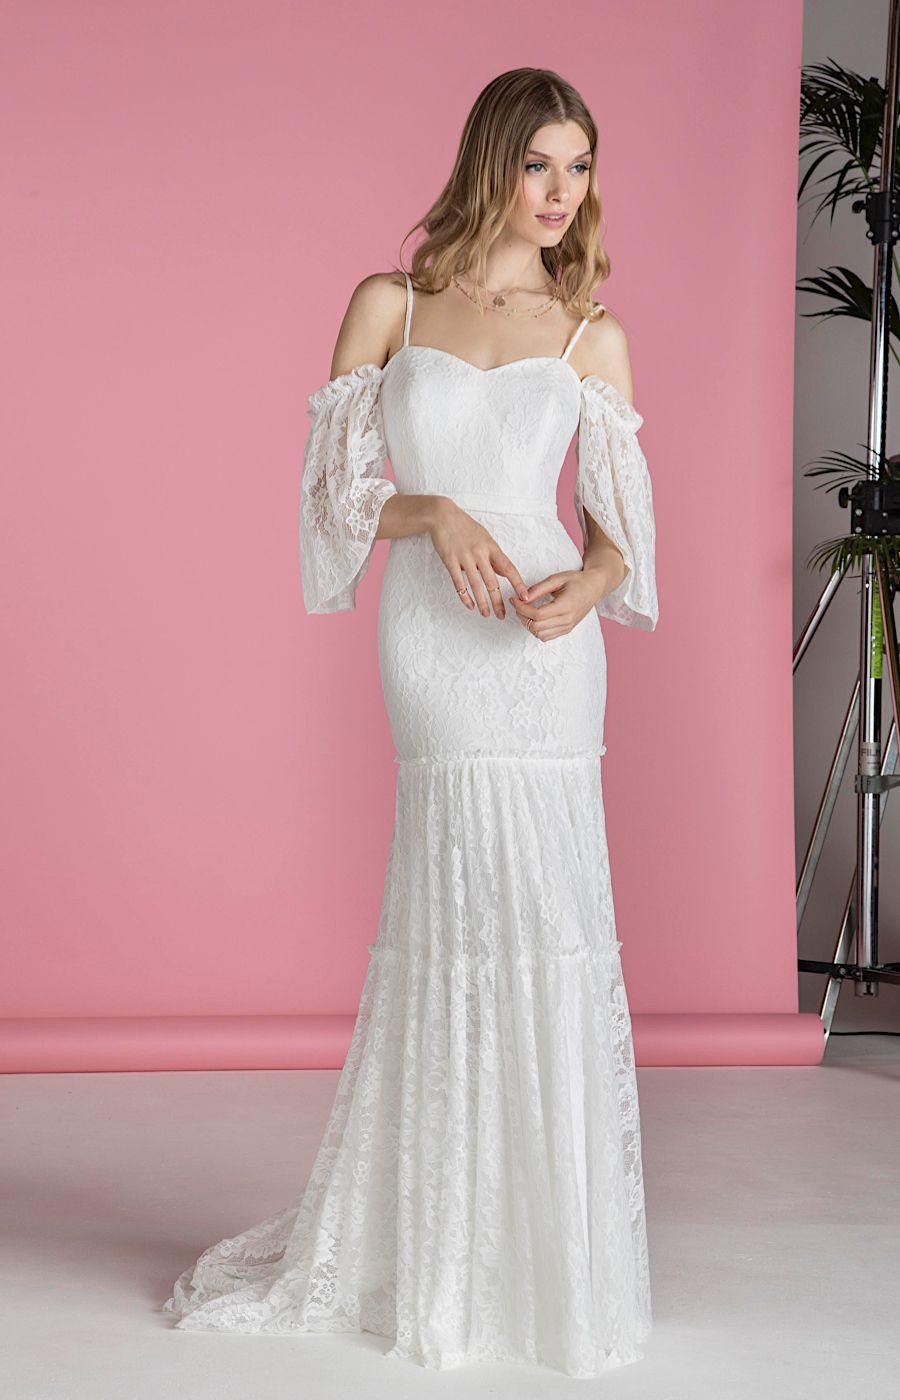 28 wedding dresses under £1,000   Wedding dresses   Pinterest